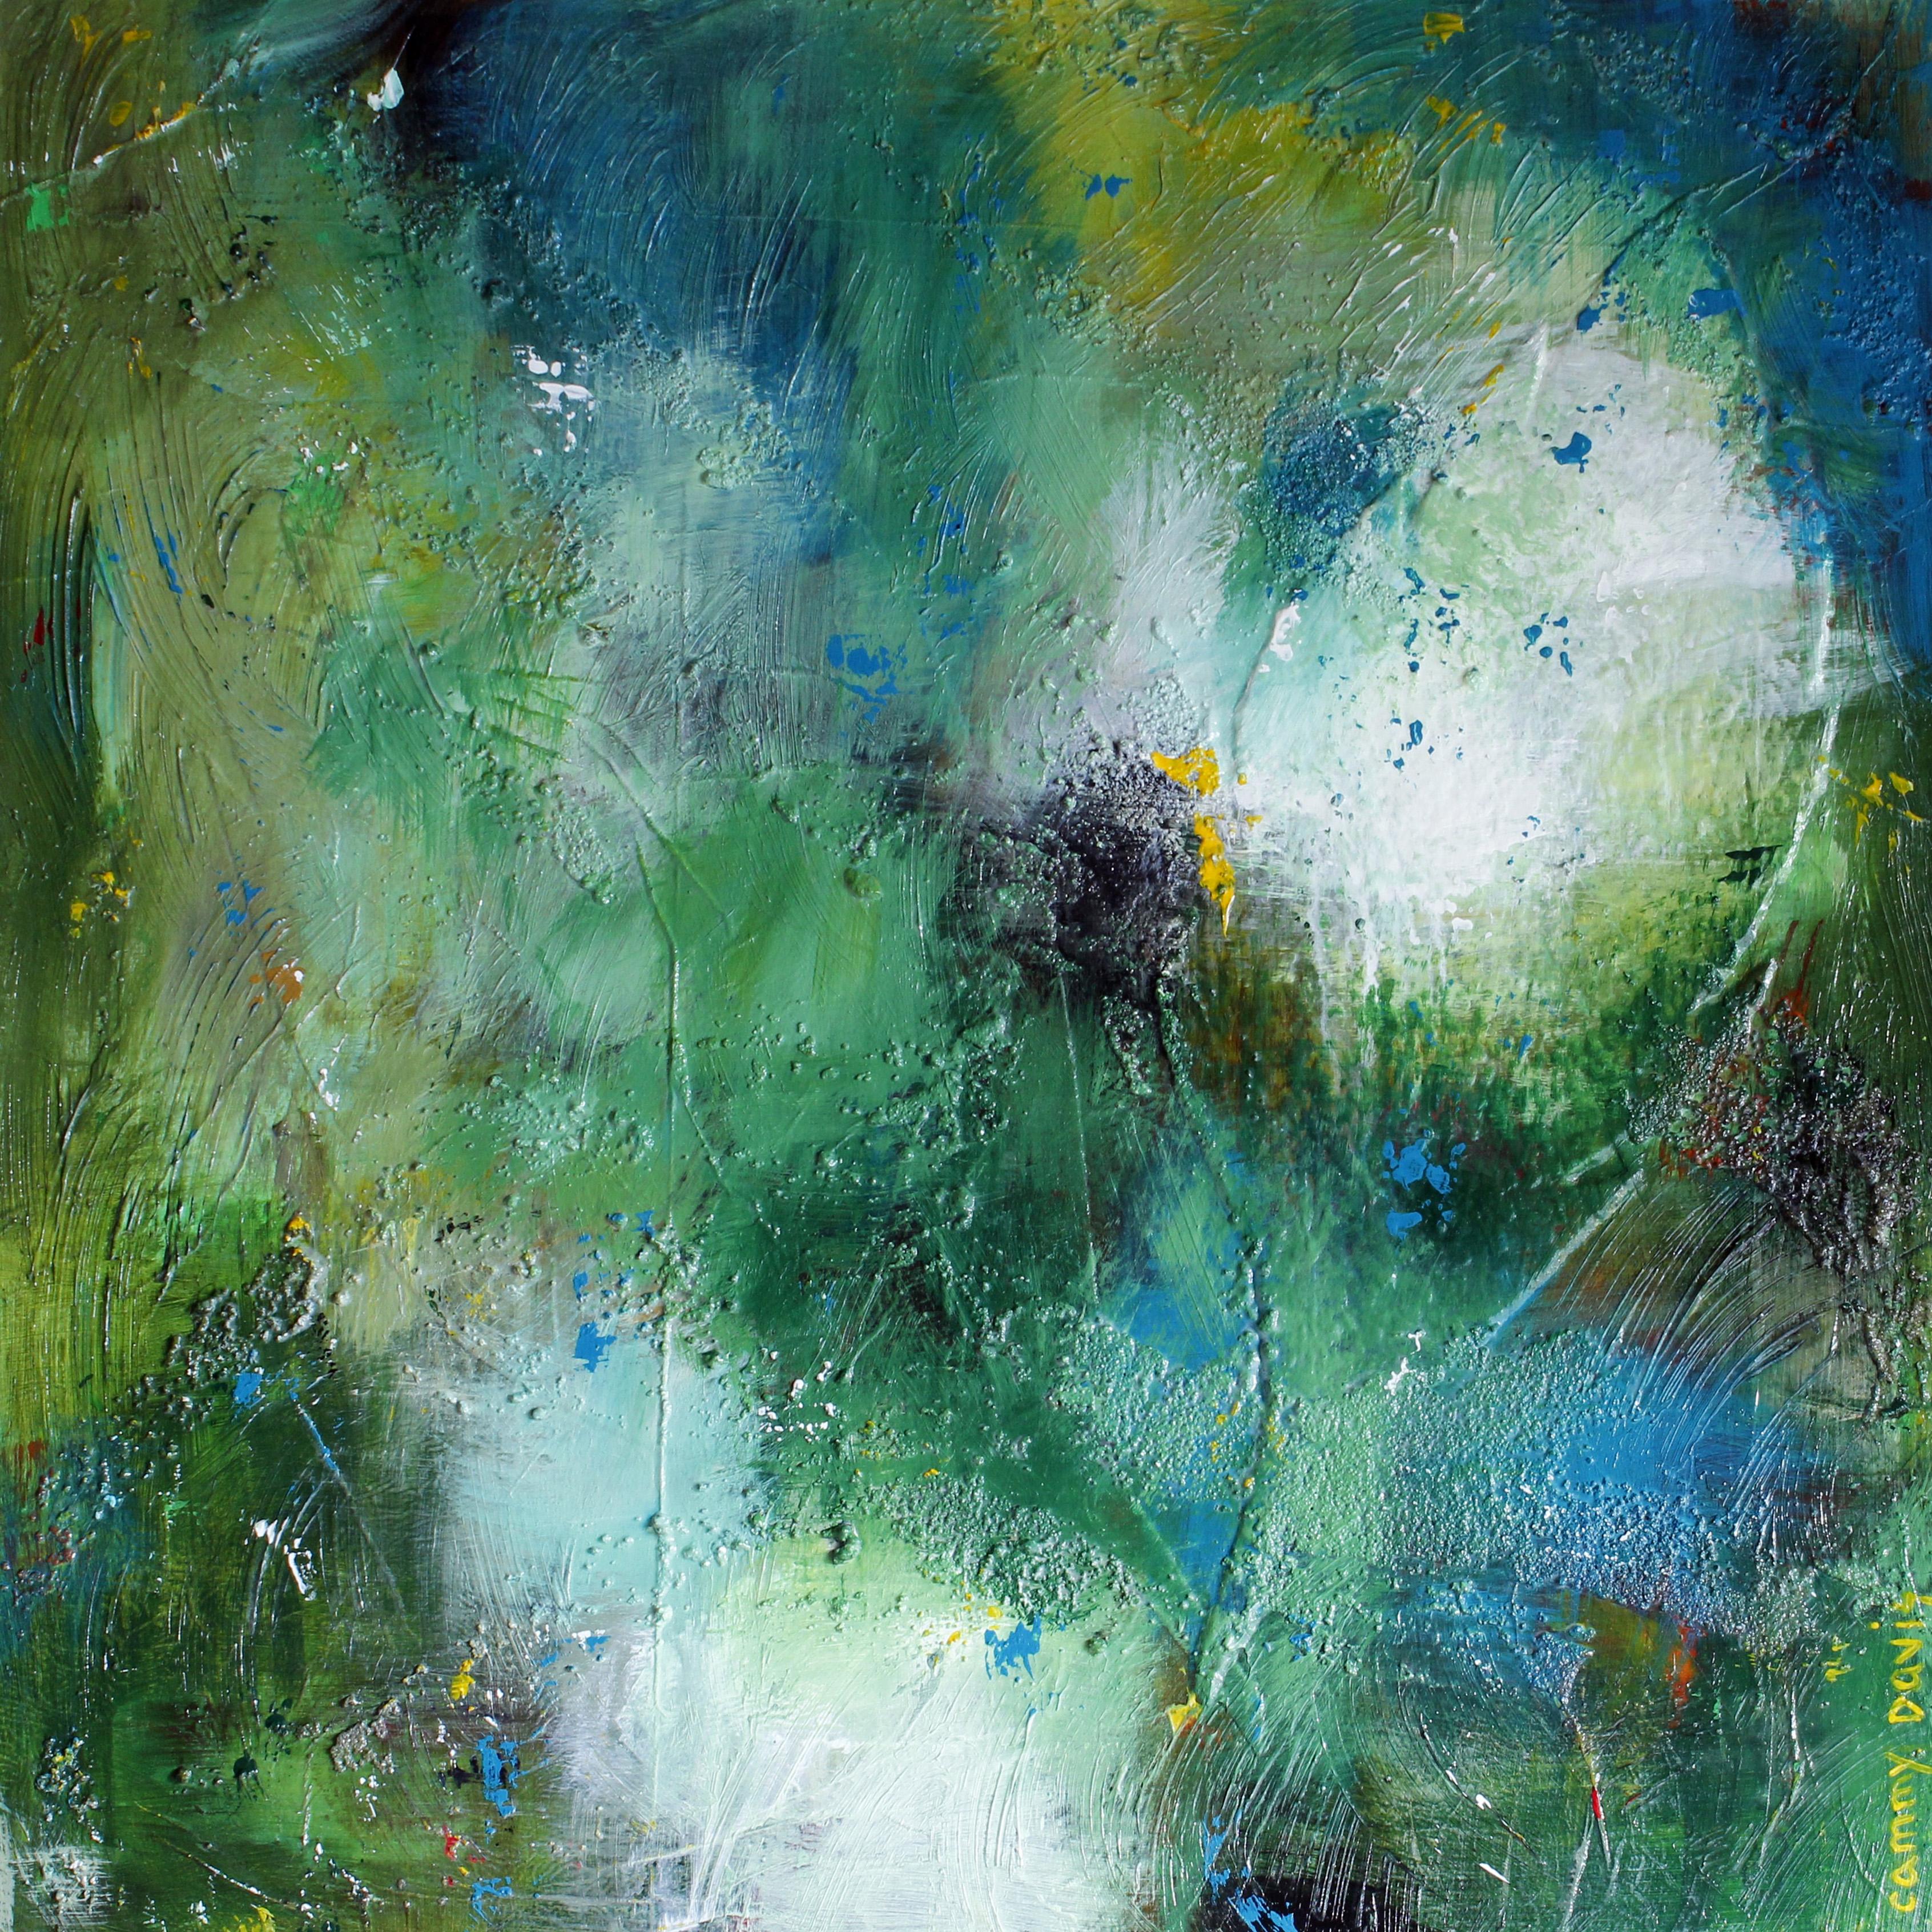 Abstract, Contemporary Art, Oregon Artist, Blue, Green, Loose Brushstrokes, Texture